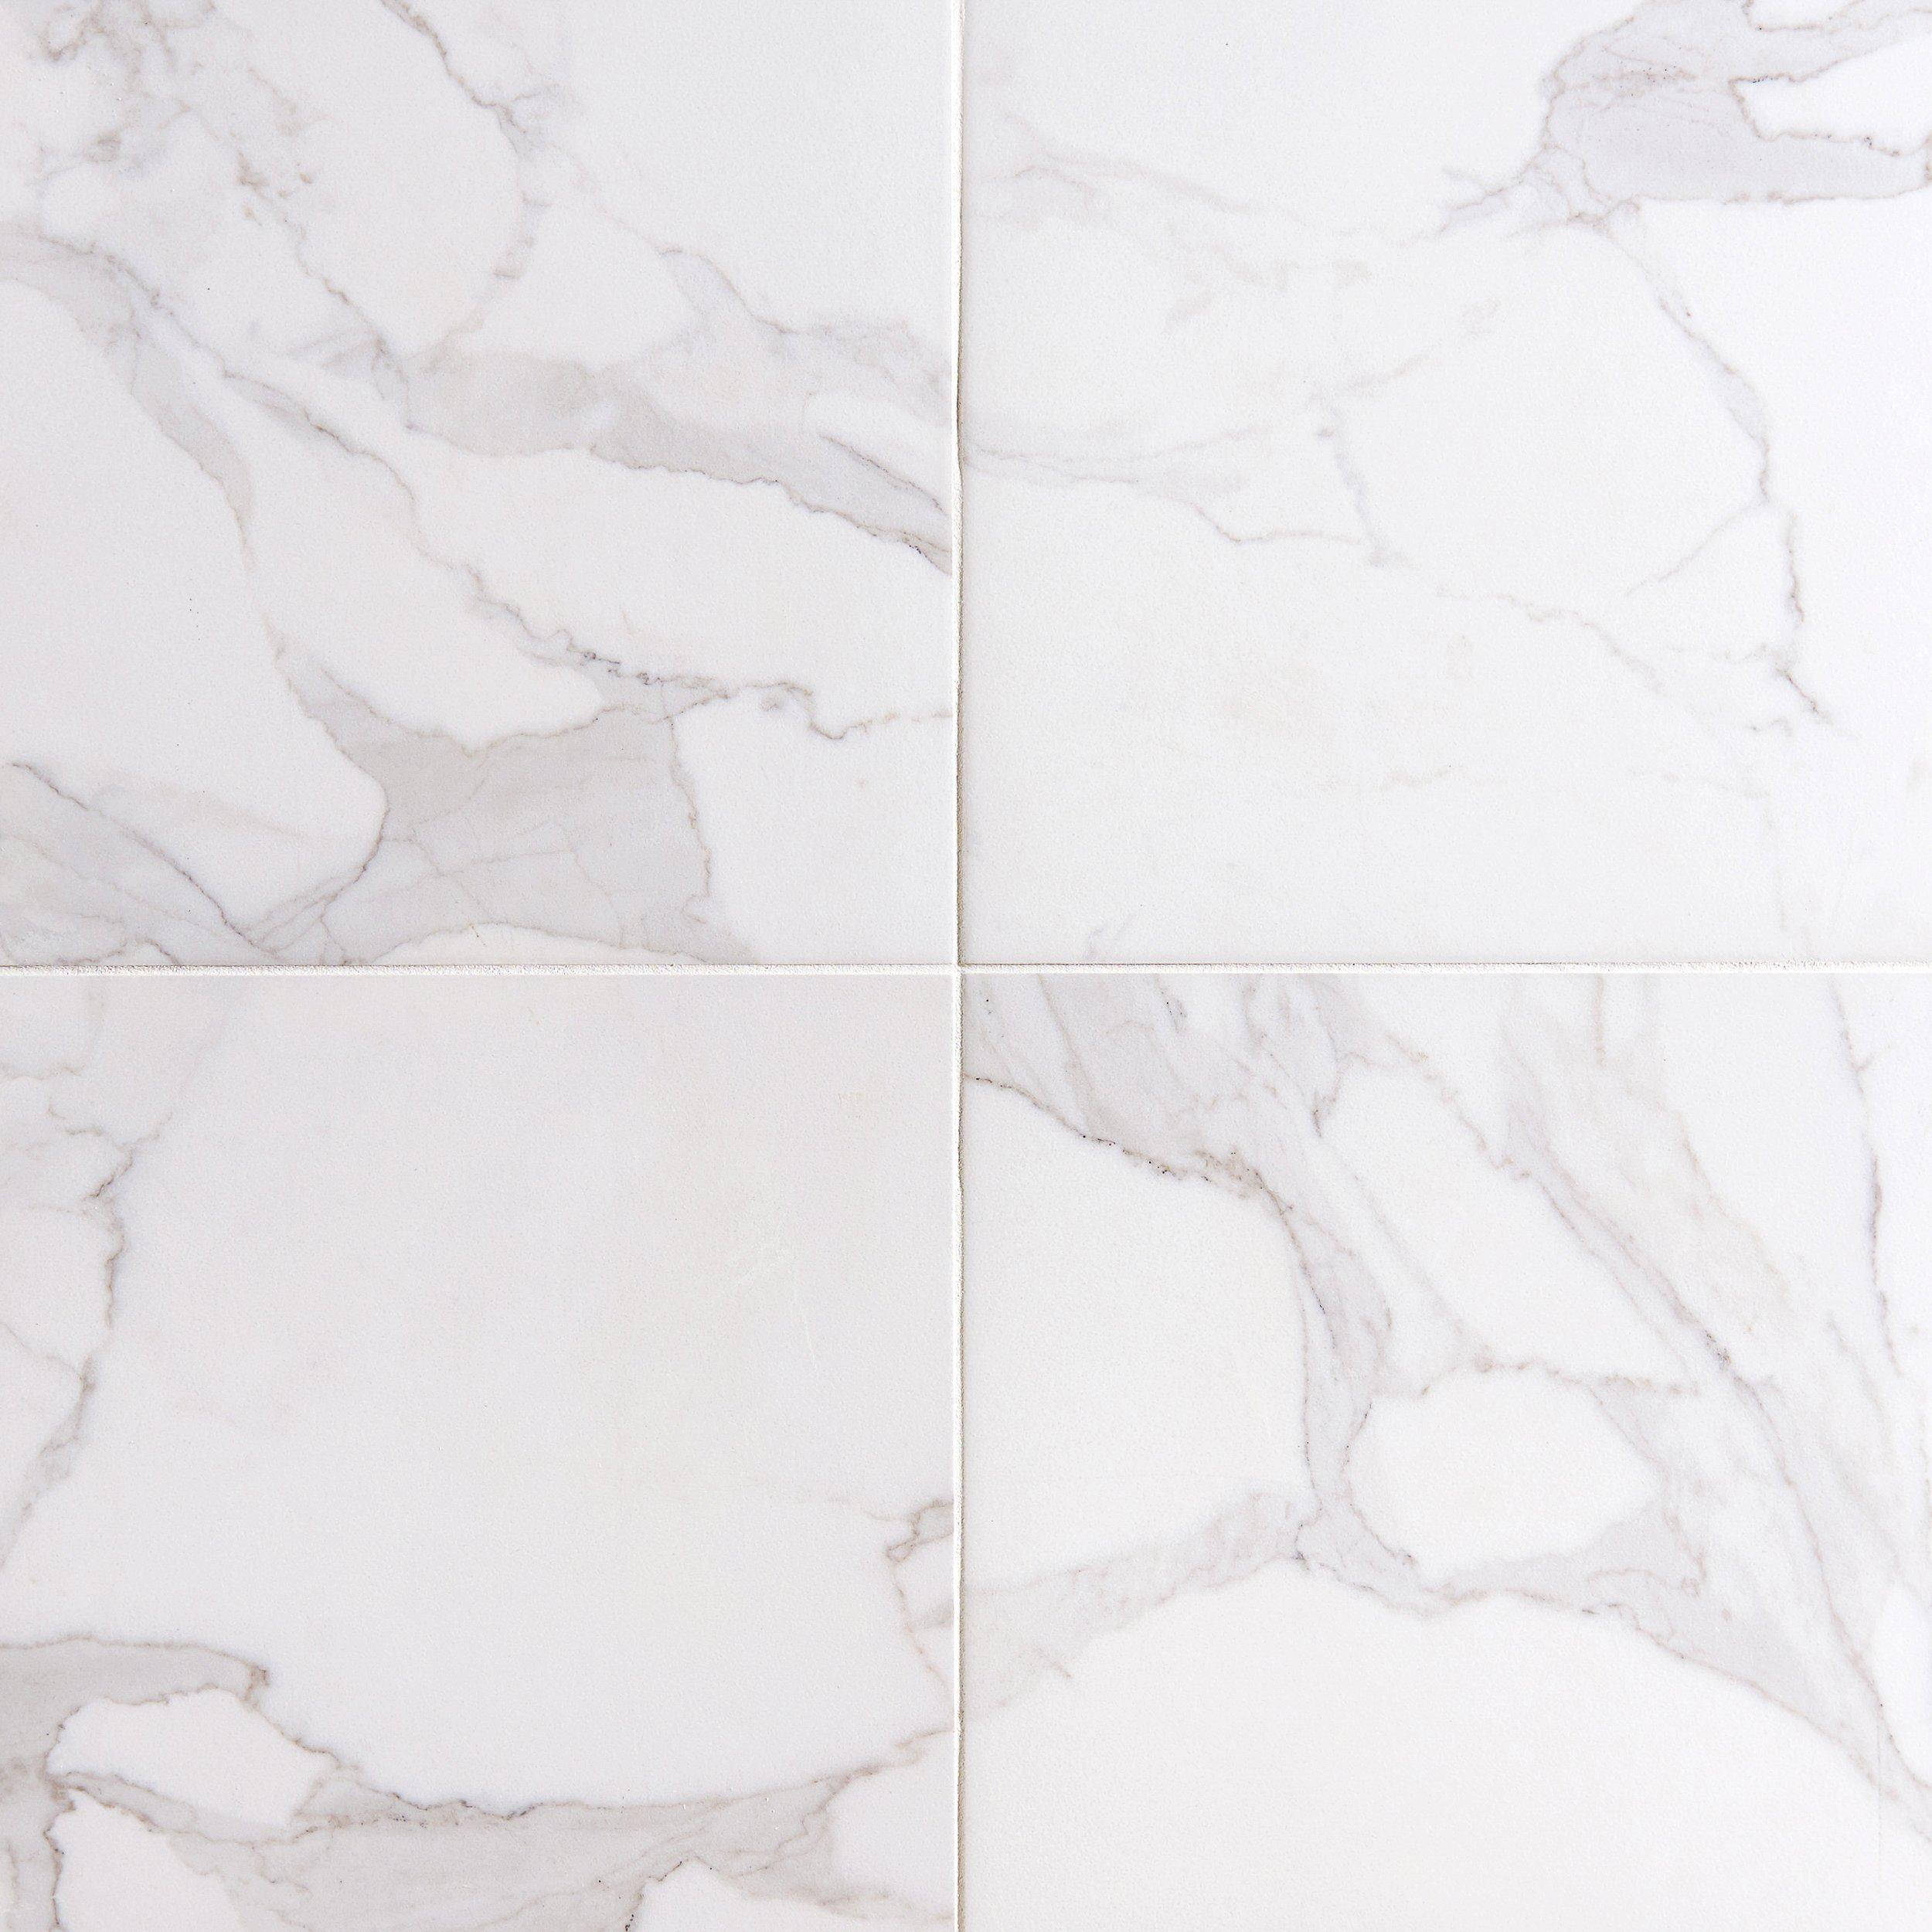 Dimarmi Bianco Porcelain Tile Floor Decor Stone Look Tile Polished Porcelain Tiles Flooring